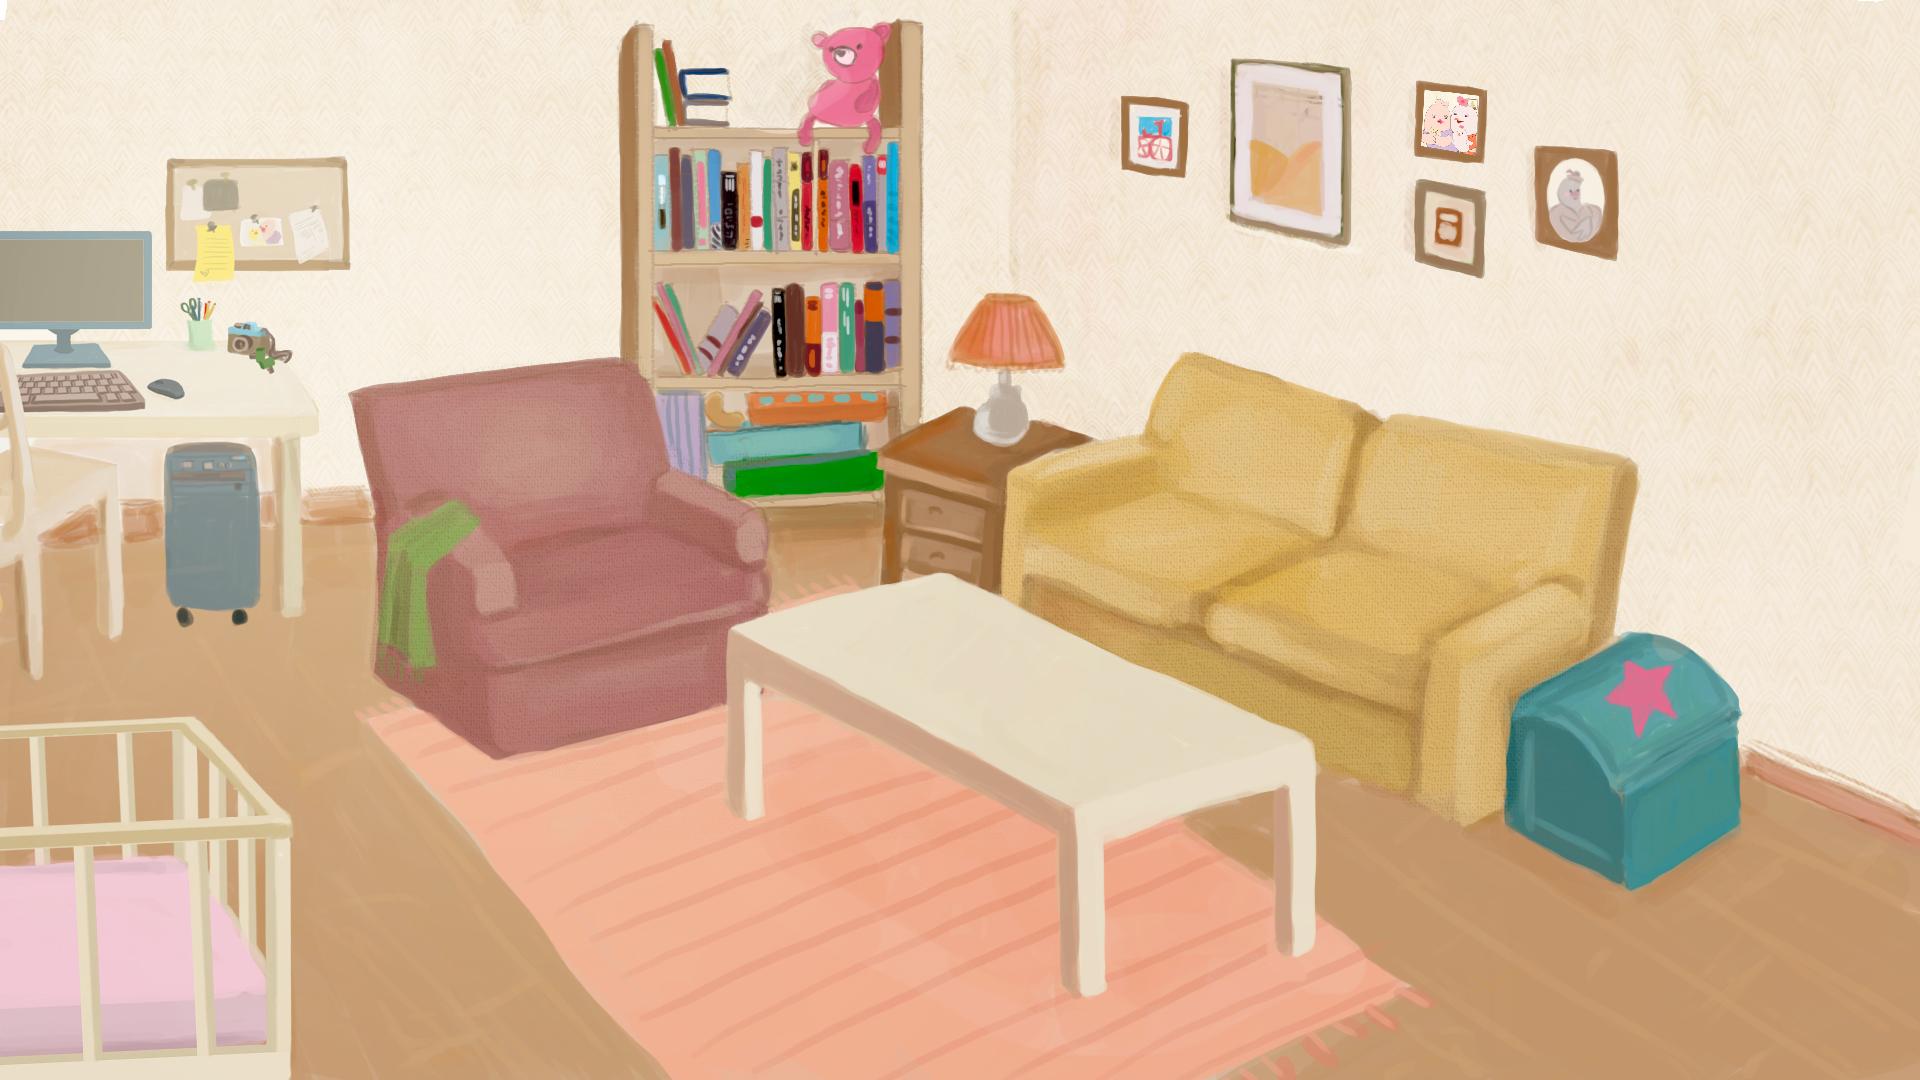 Bkg For Animation #2